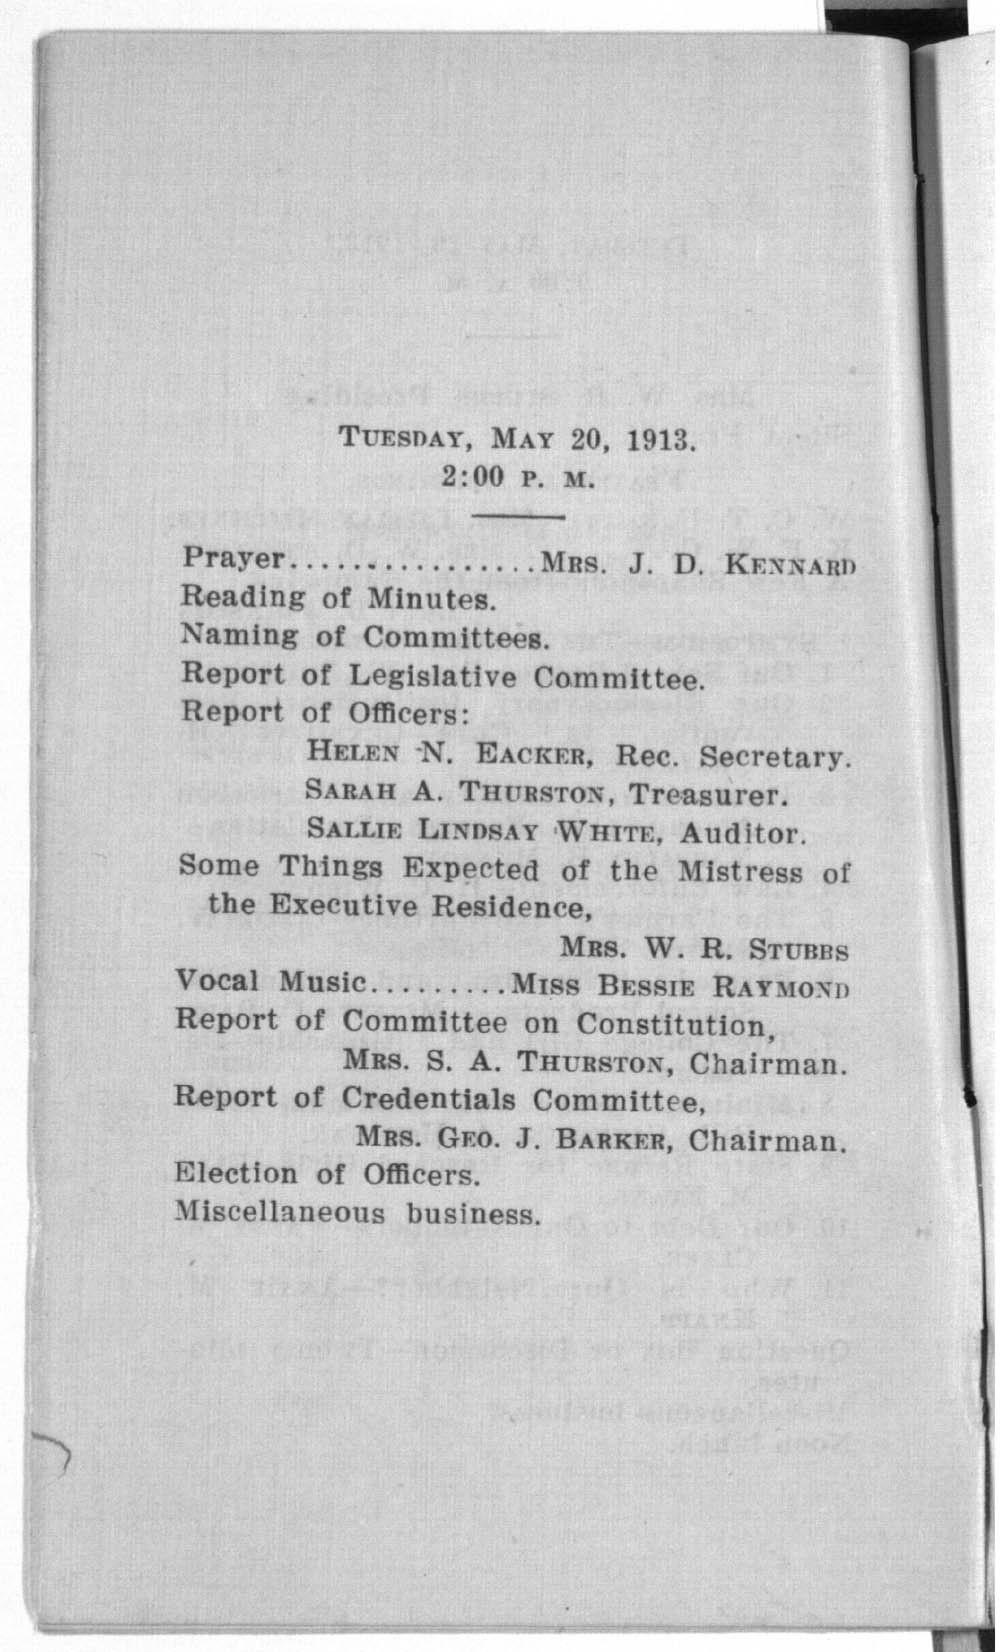 Kansas Equal Suffrage Association thirtieth annual convention - 7